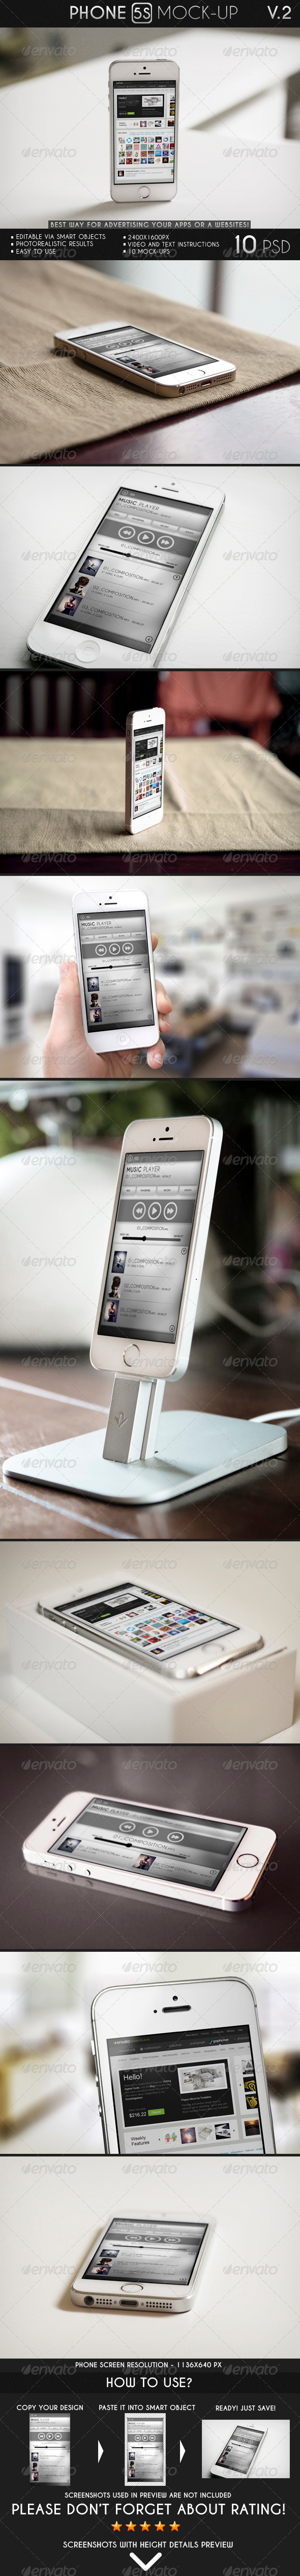 Phone 5S Mock-Up - Mobile Displays